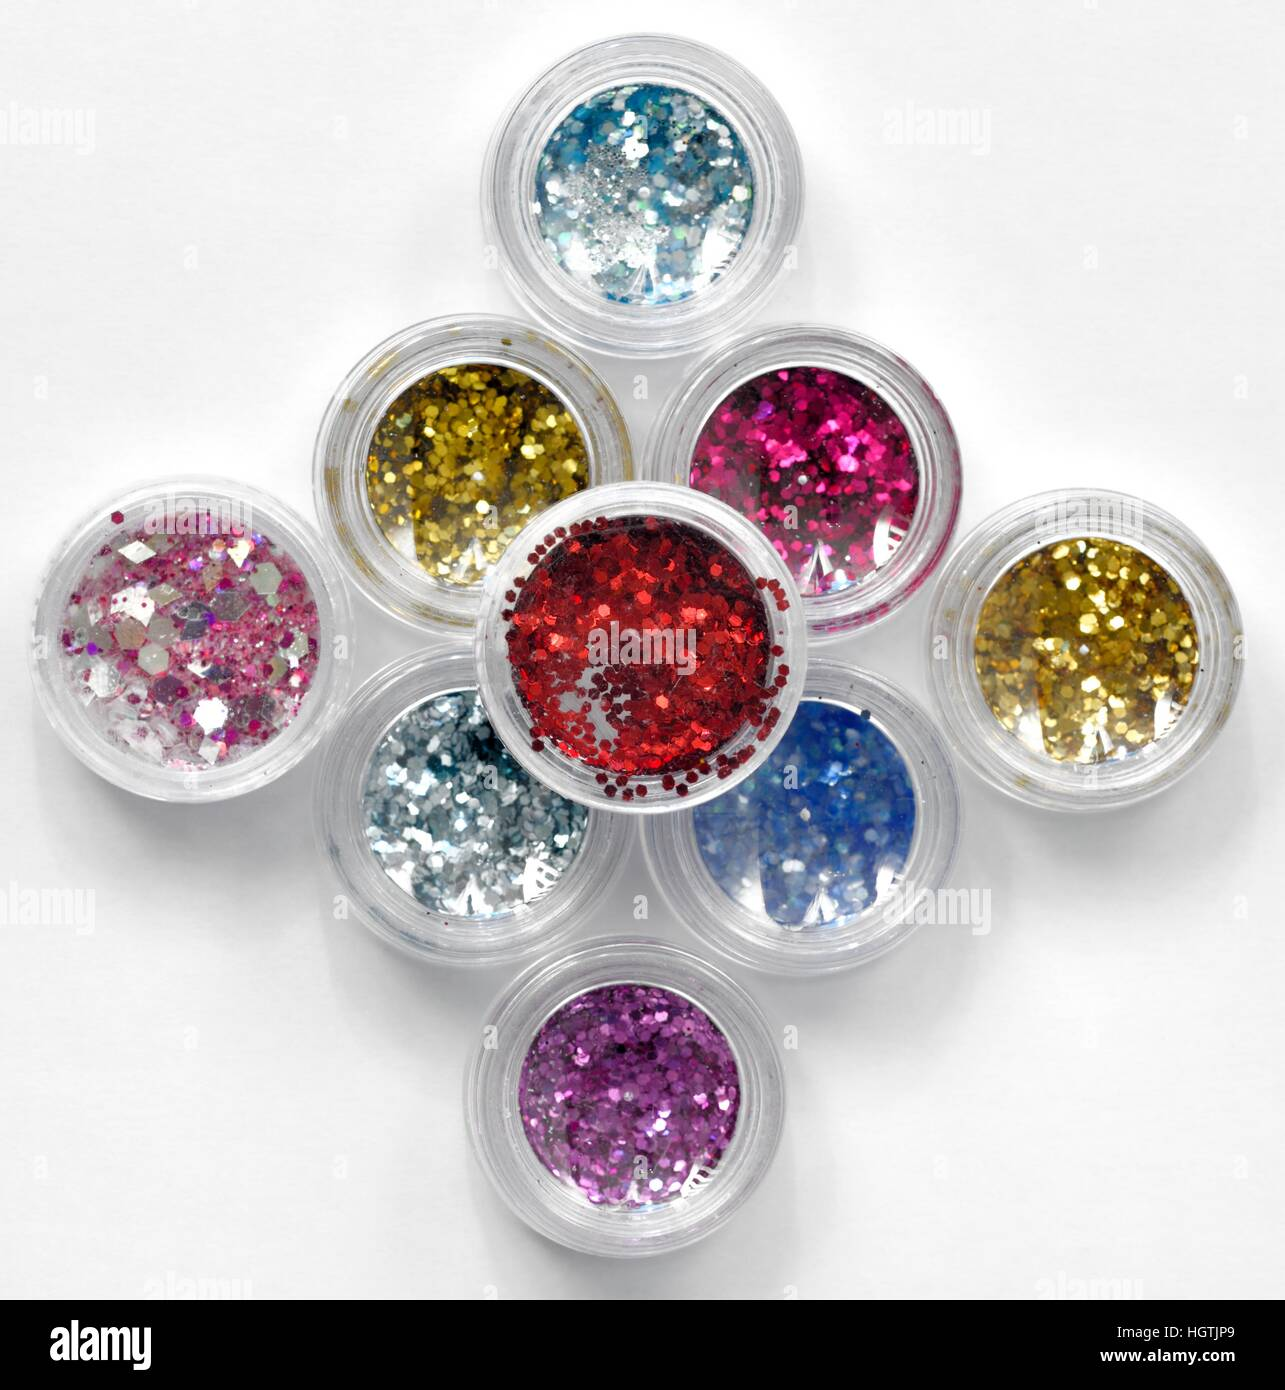 Small plastic pots of nail glitter - Stock Image